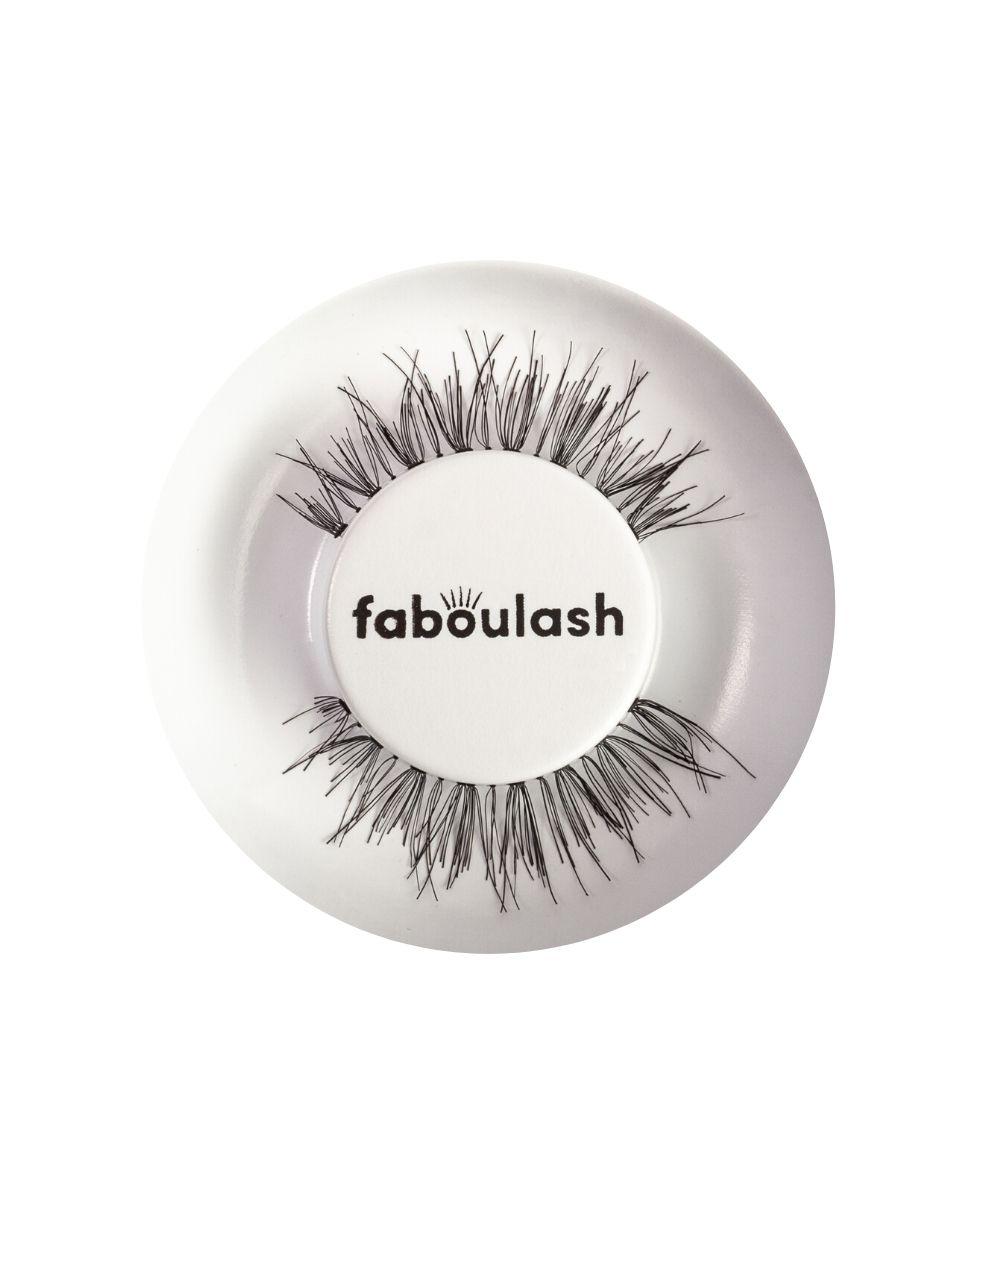 Faboulash 907 by Faboulash